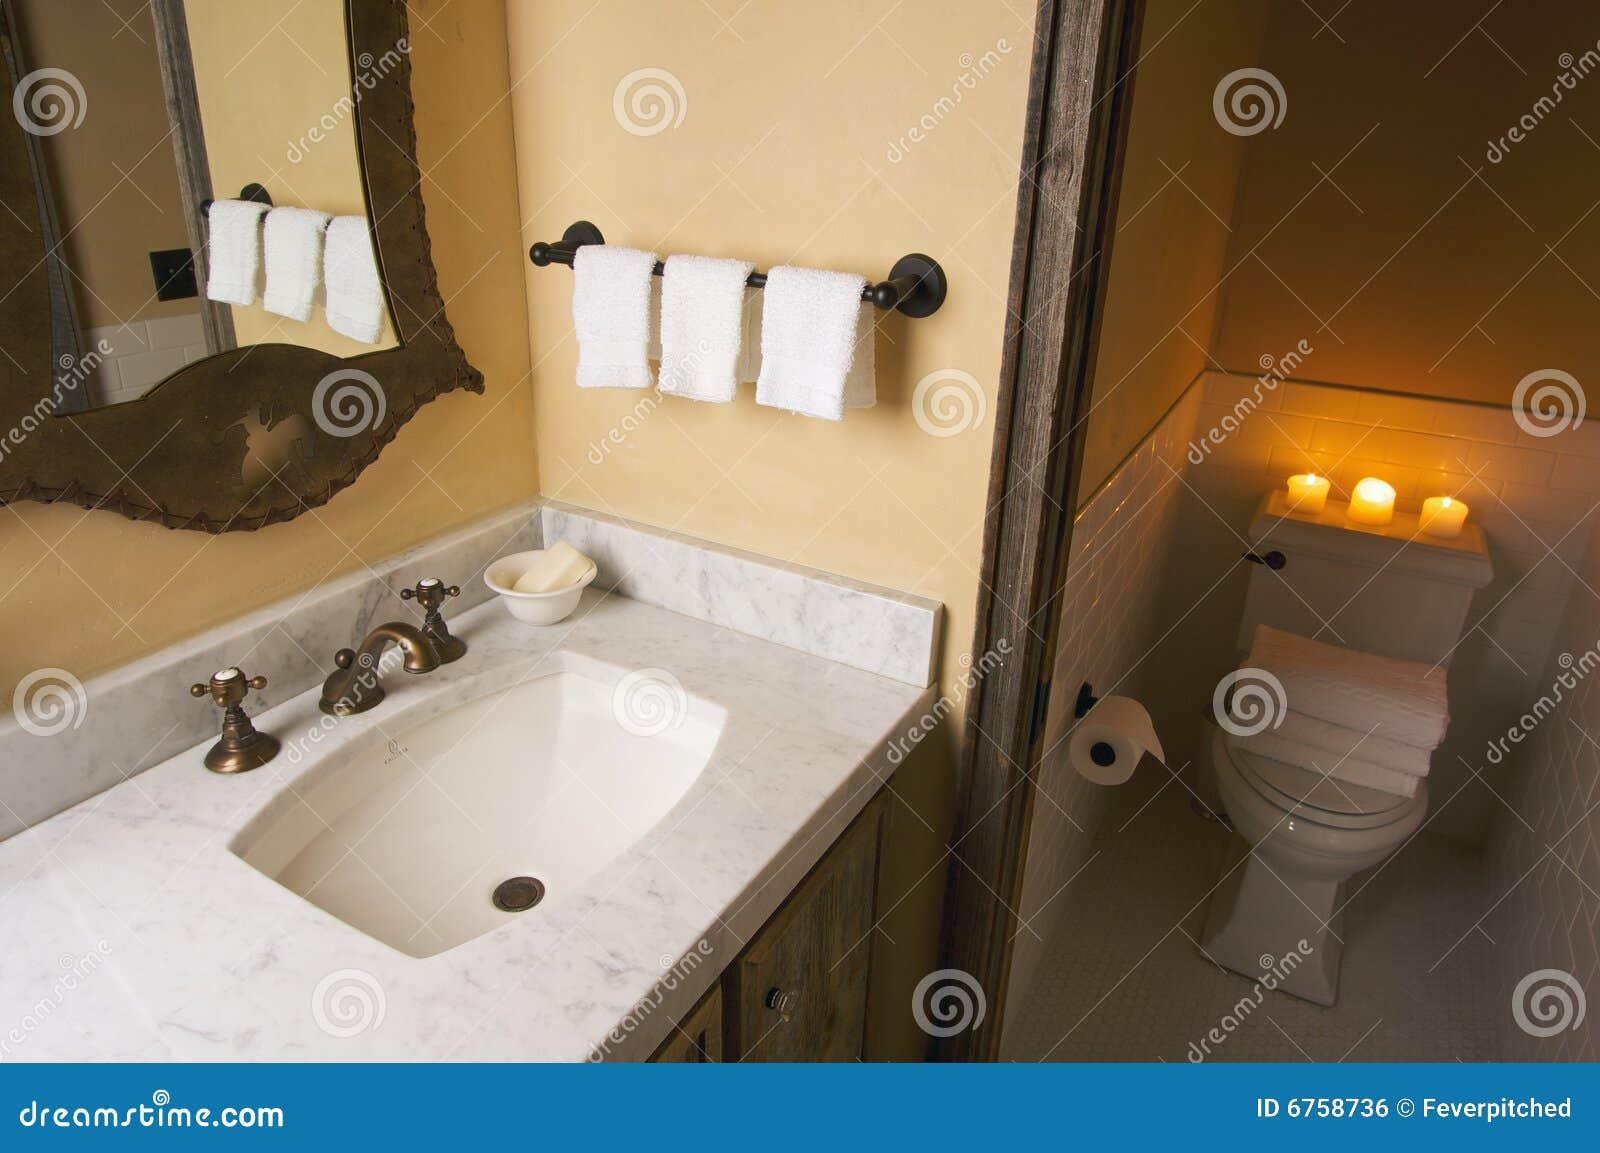 Rustikale badezimmer szene stockfoto bild von keramisch 6758736 - Rustikale badezimmer ...